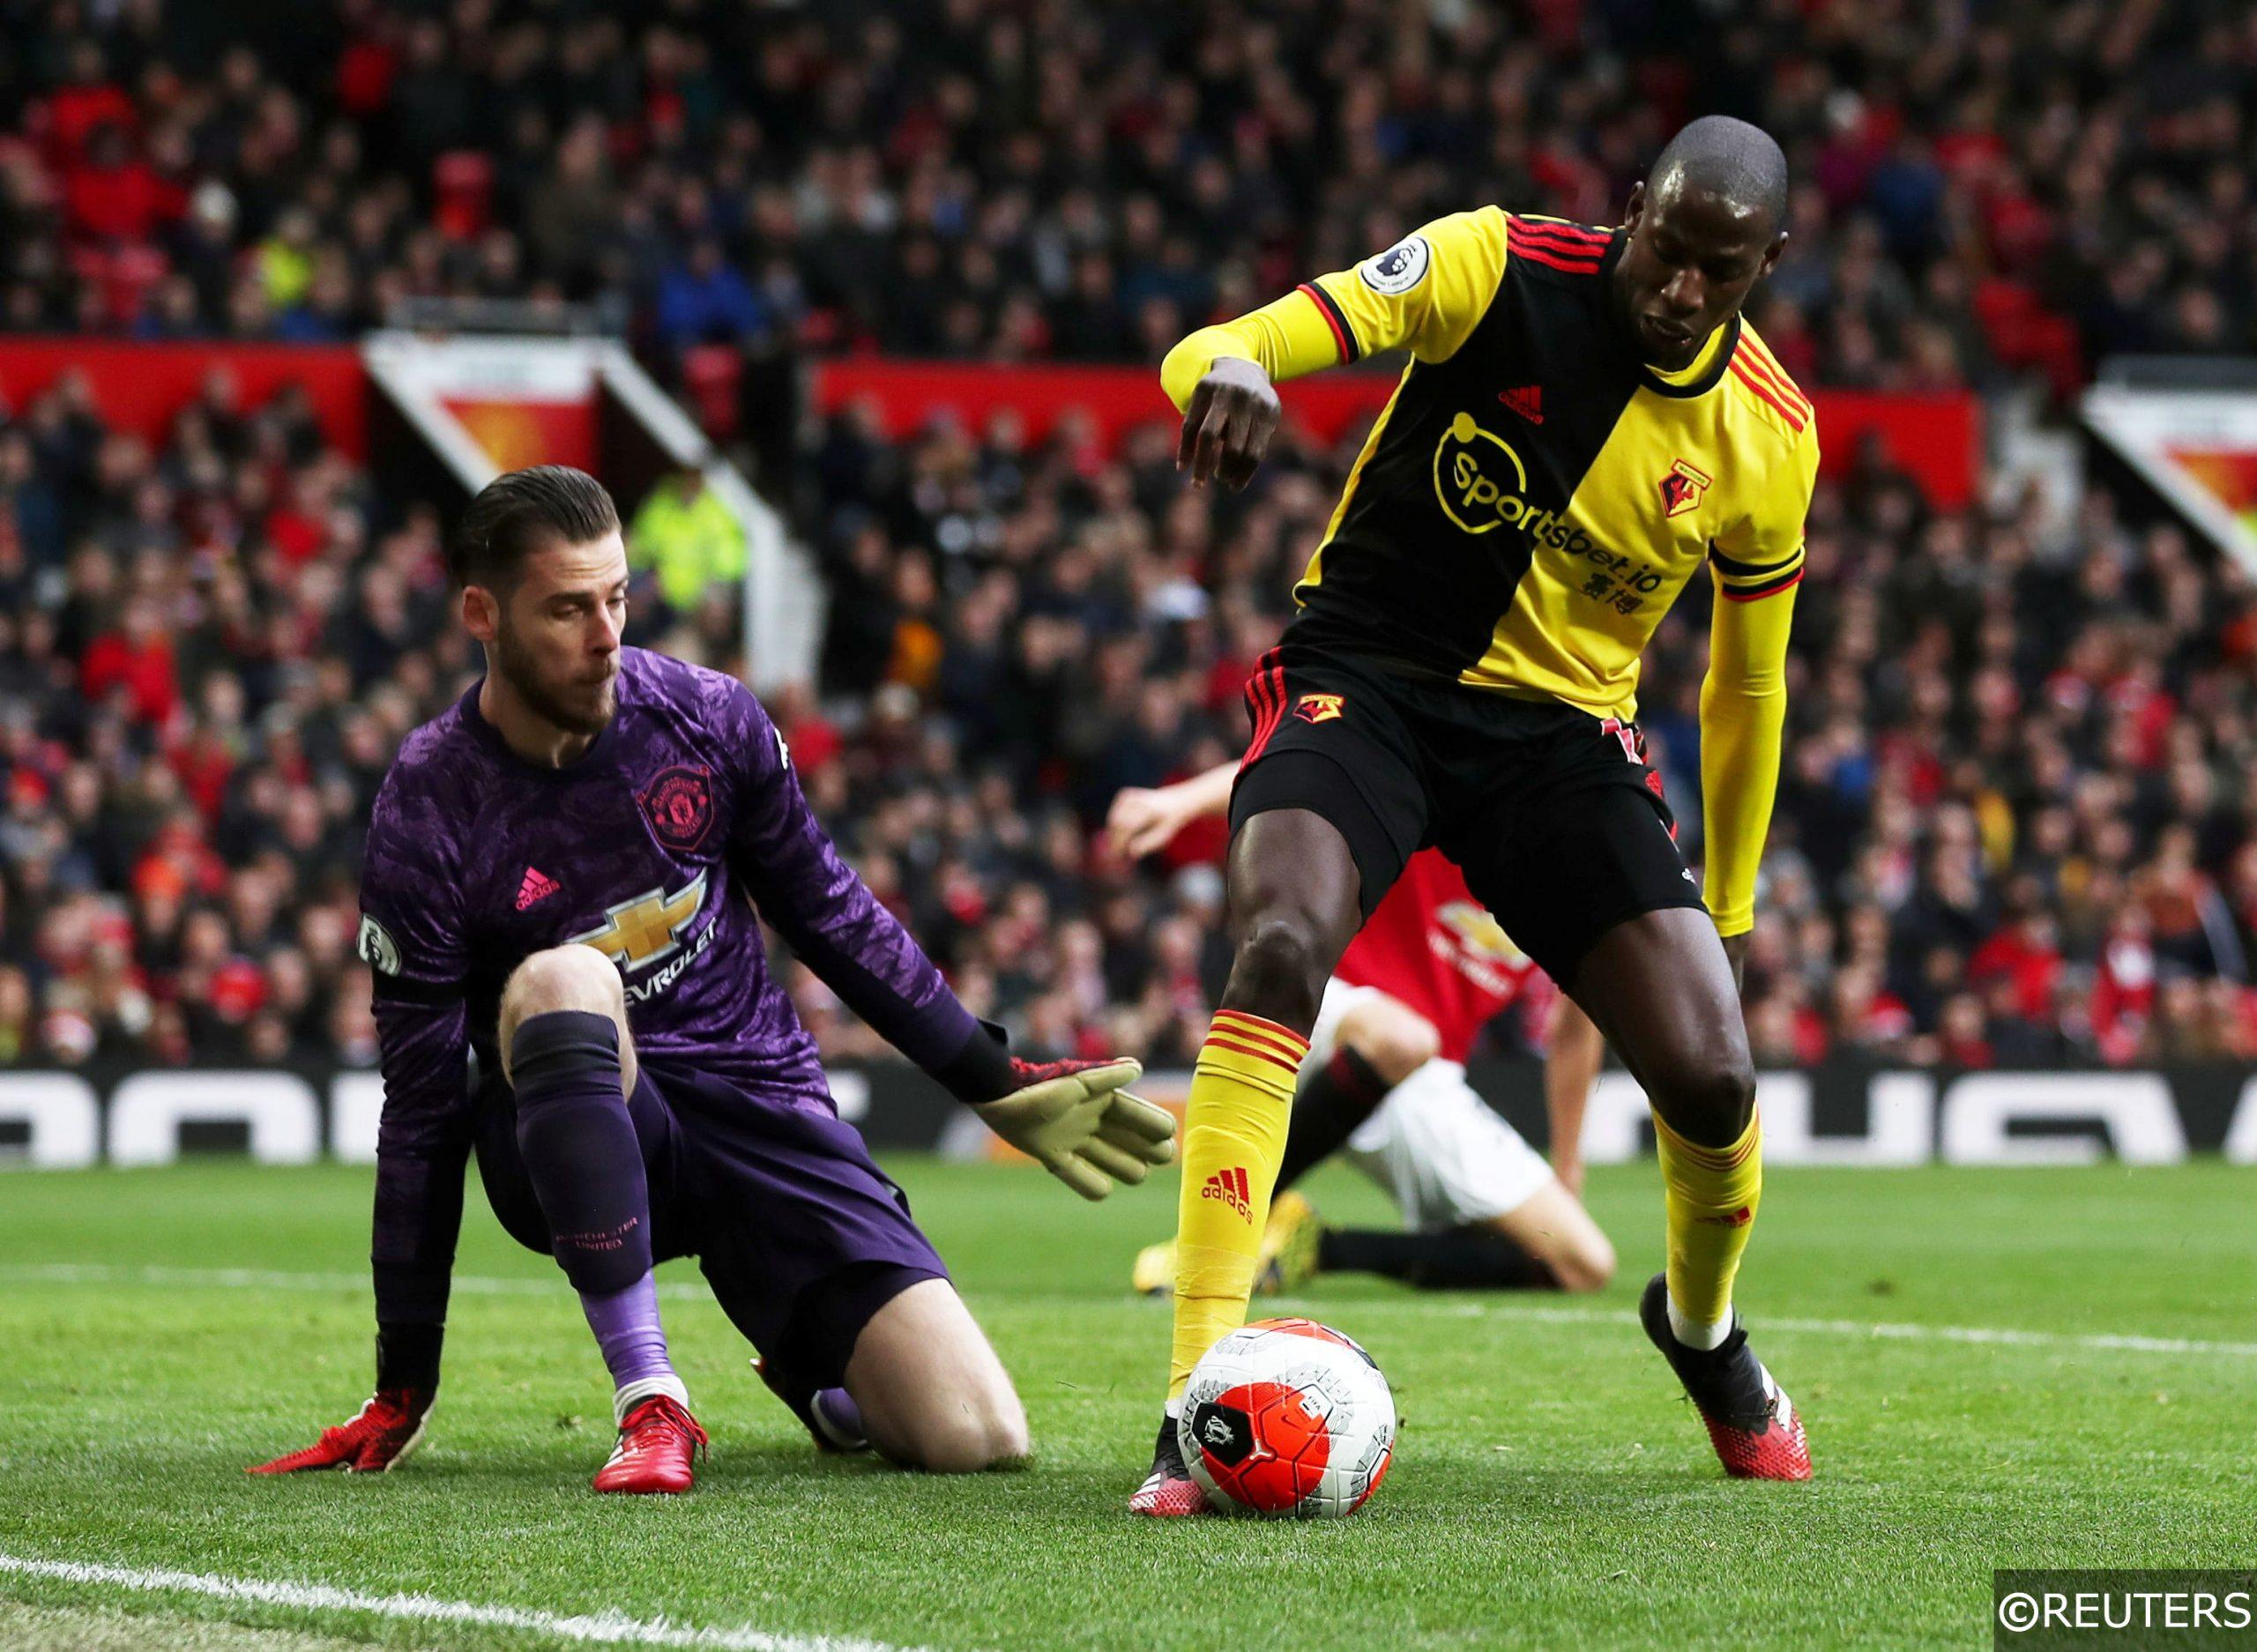 Watford midfielder Abdoulaye Doucoure vs Man Utd